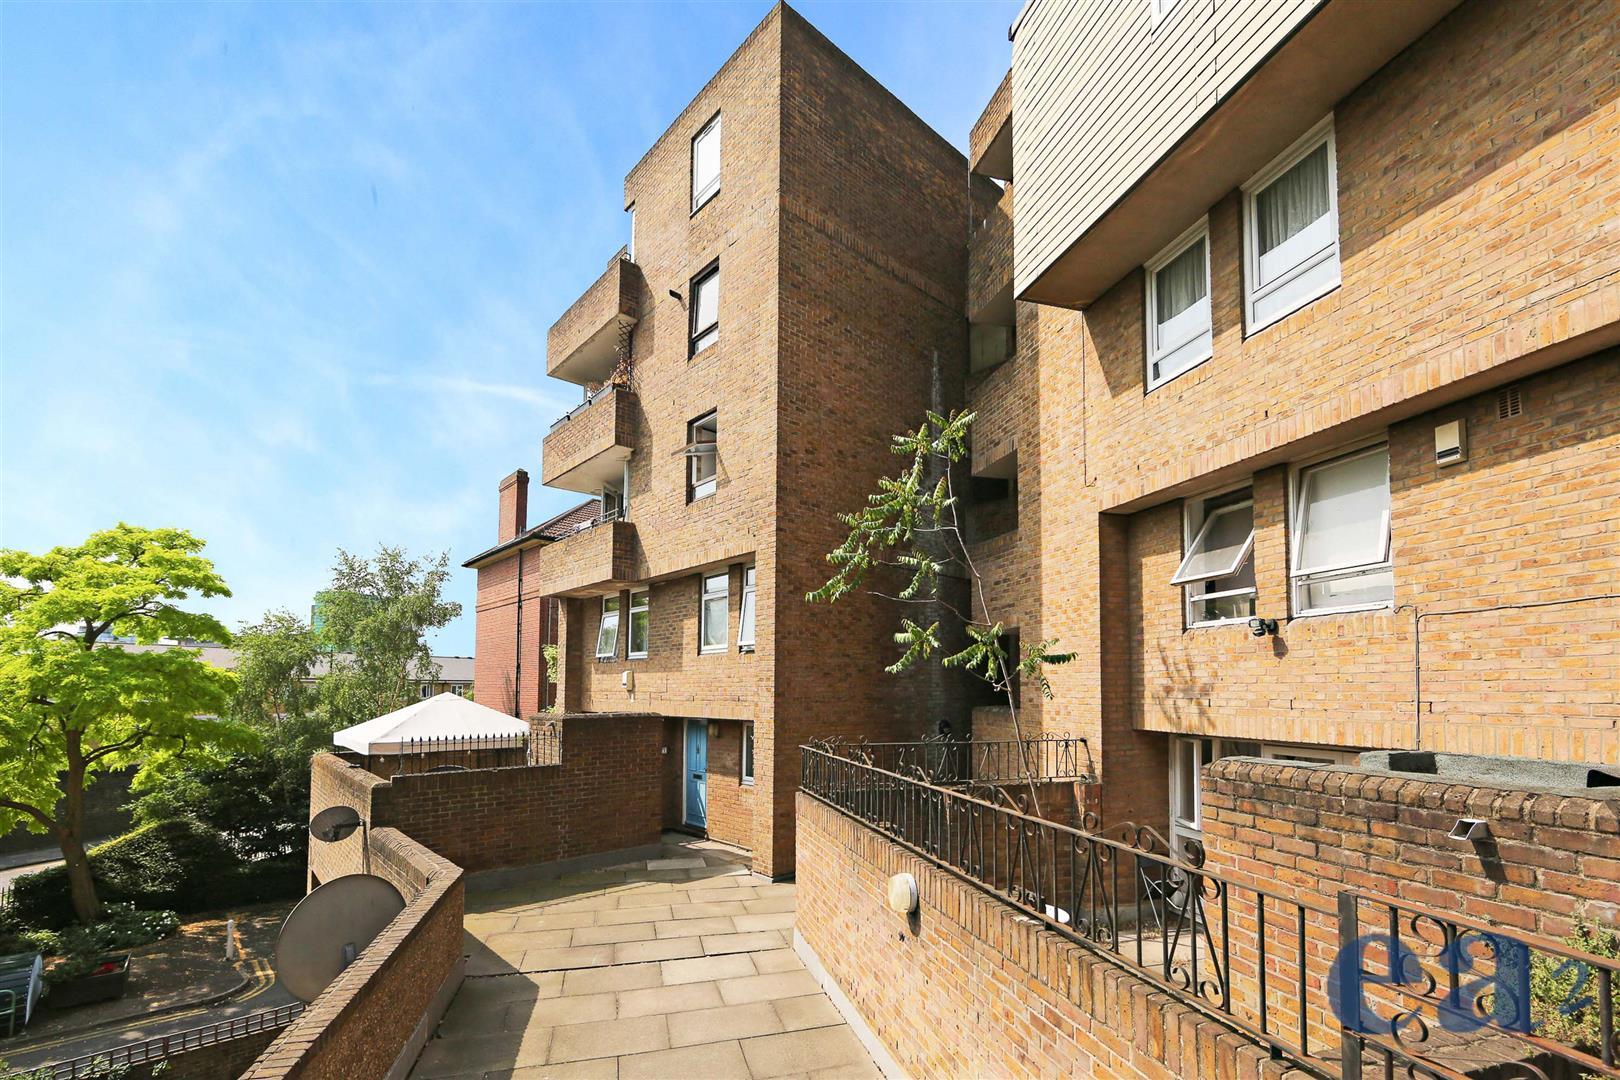 2 Bedroom Flat For Sale St Anthonys Close London E E1 1yj